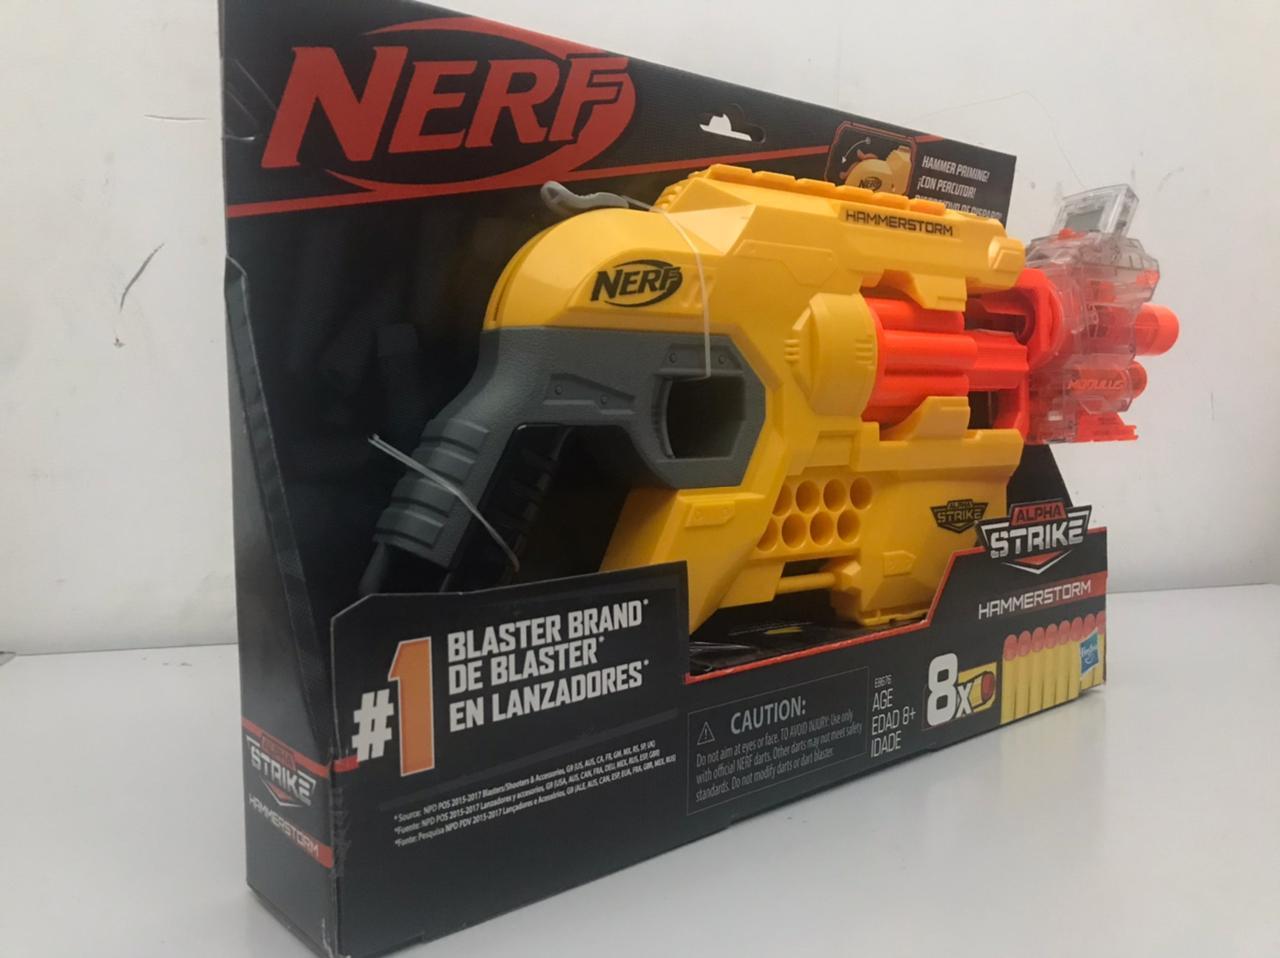 Kit Nerf Alpha Strike Hammerstorm + Nerf N-Strike Modulus Ghost Ops Chronobarrel